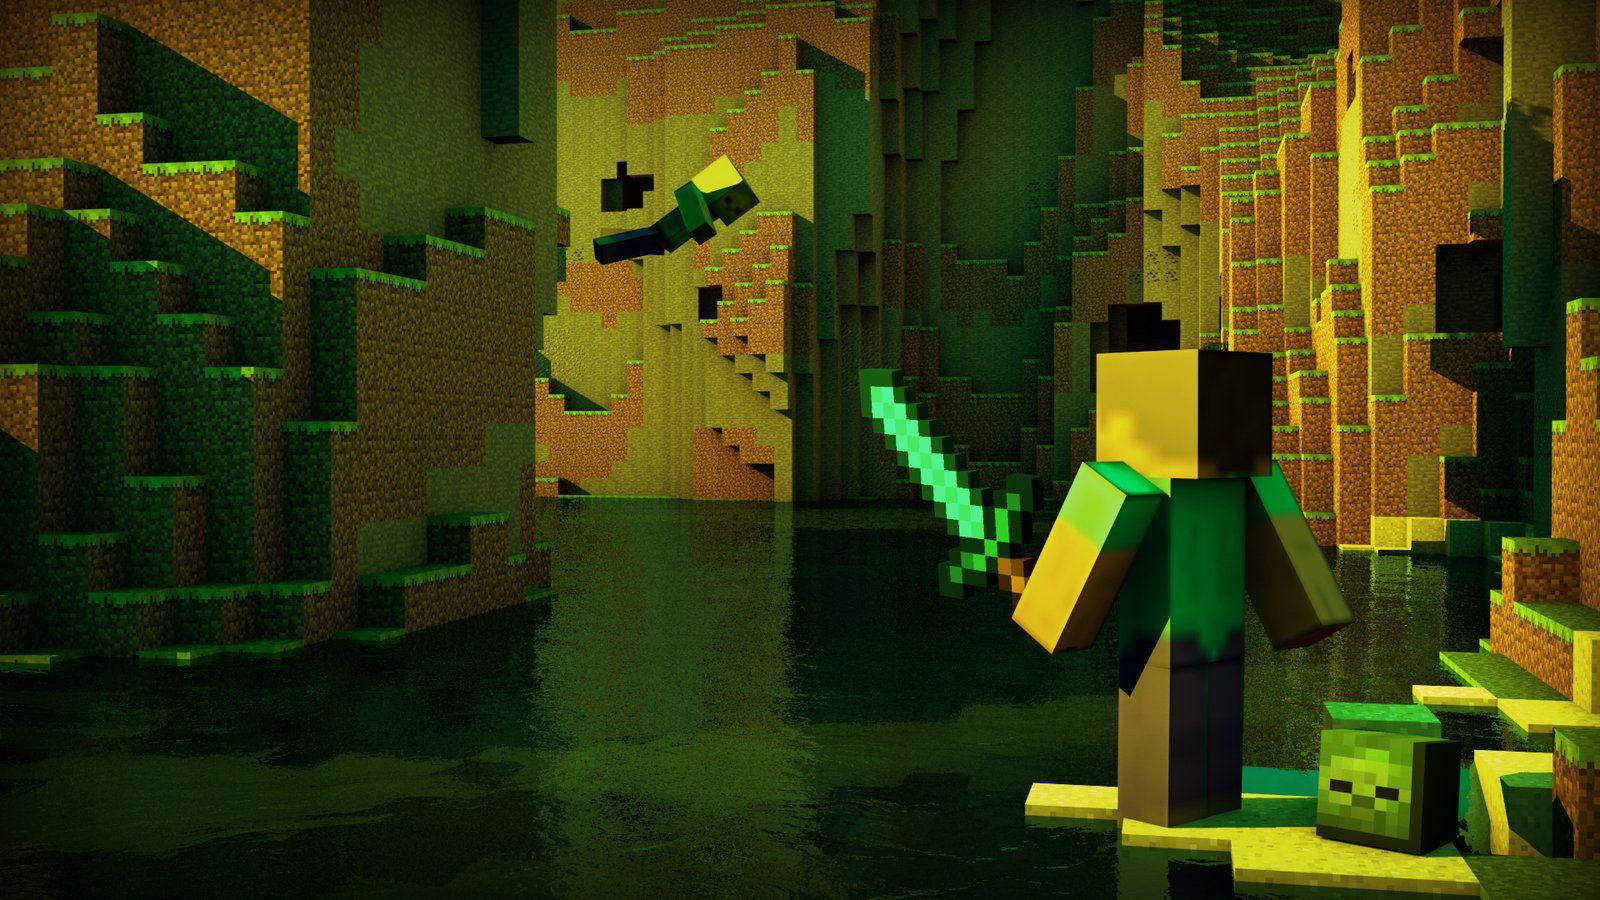 Fantastic Wallpaper Minecraft Zombie Pigman - 05c416391e246842b94541c555f68e77  Pictures_1003528.jpg